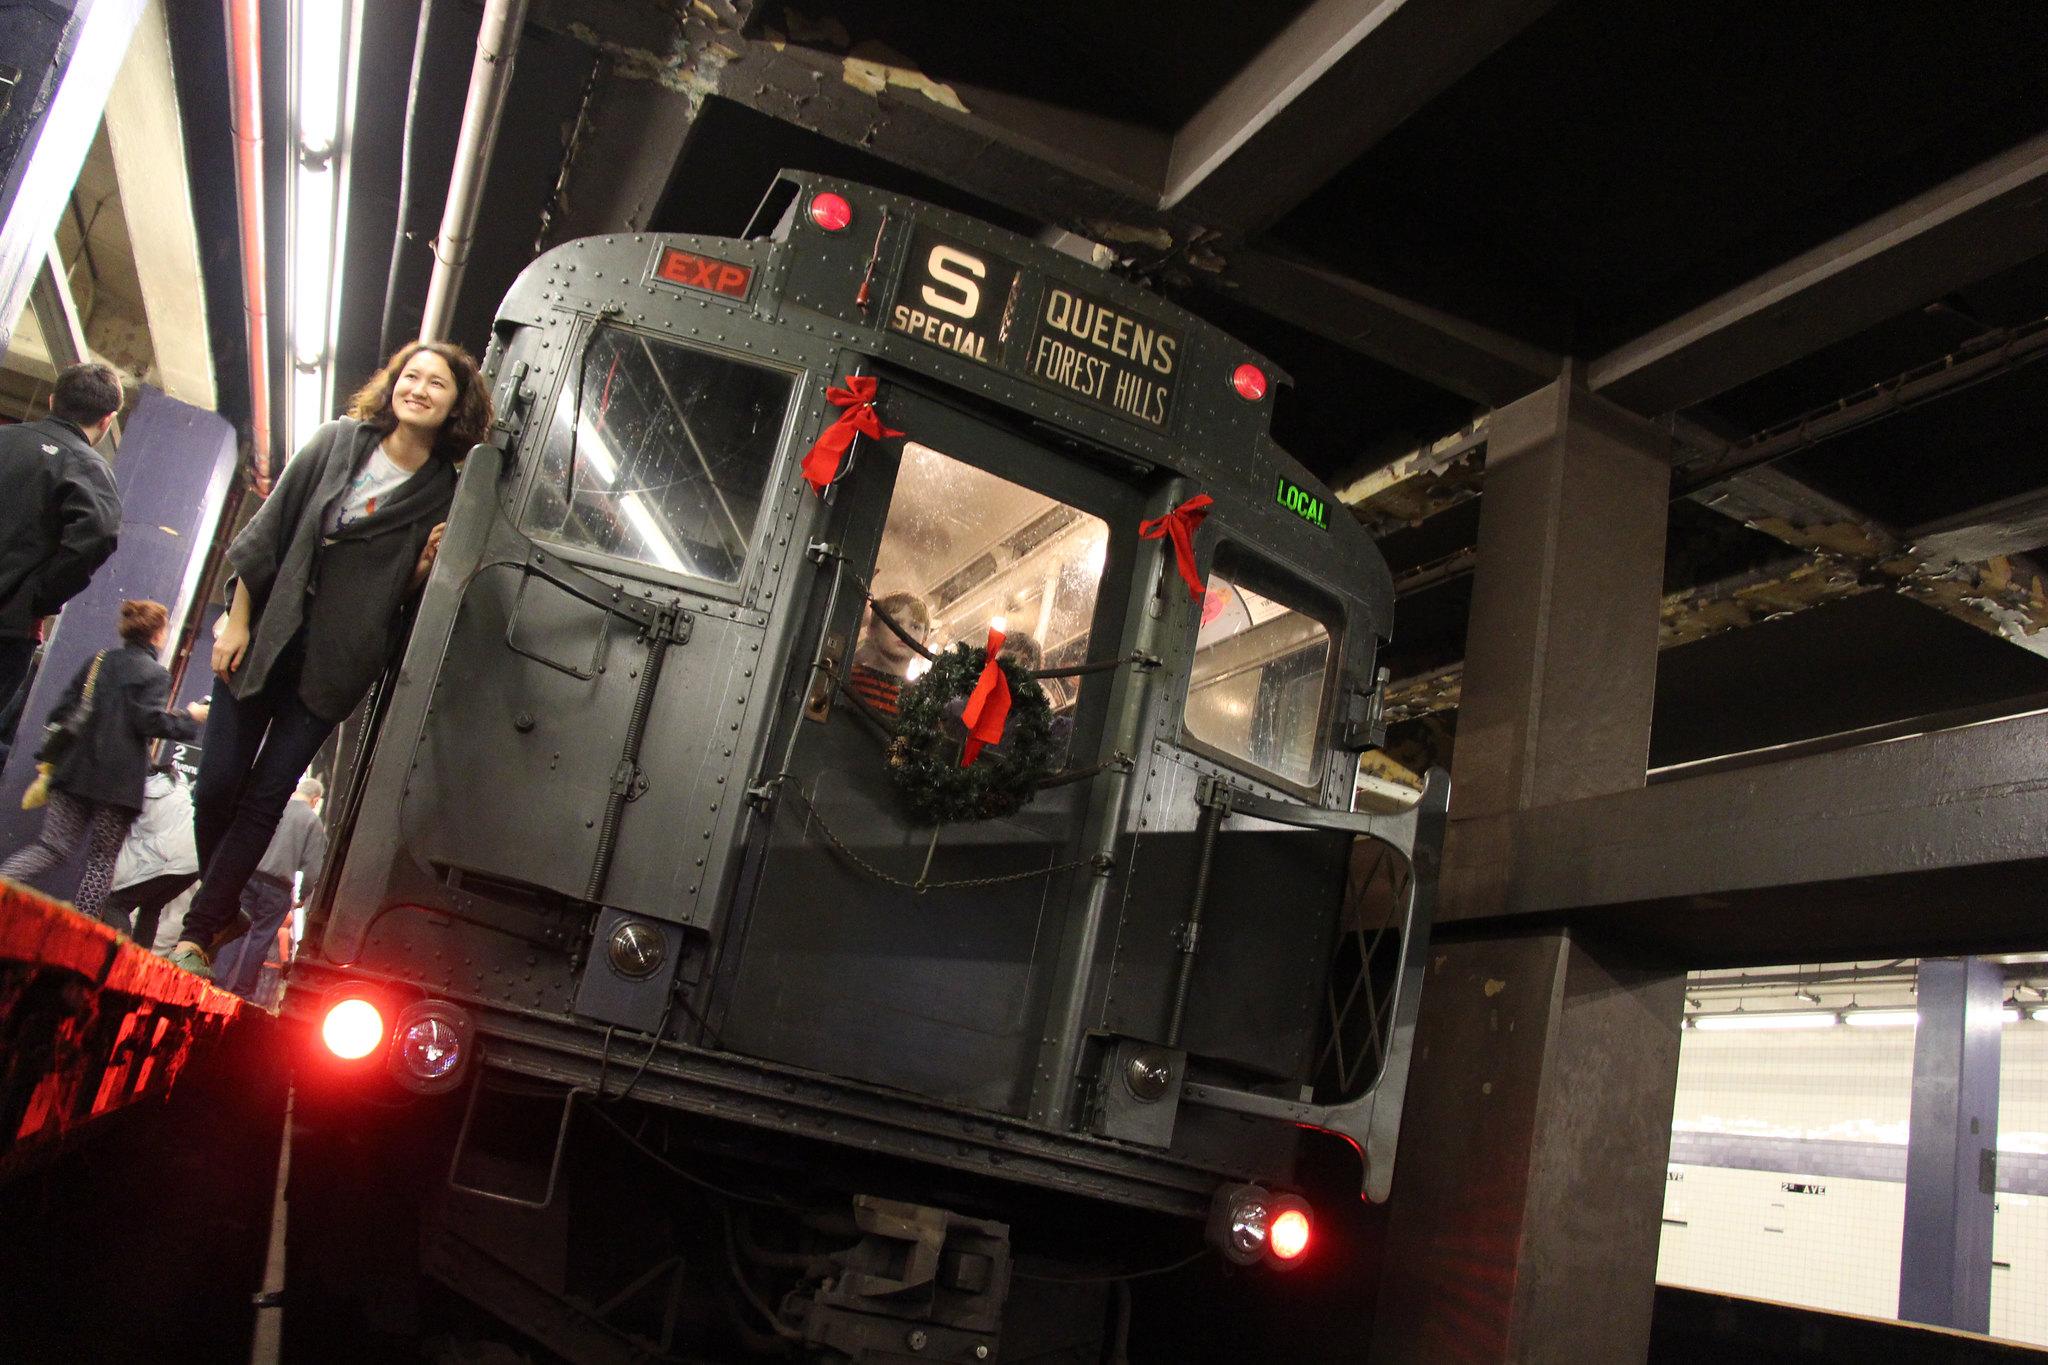 Holiday Nostalgia Train - December 22nd, 2013